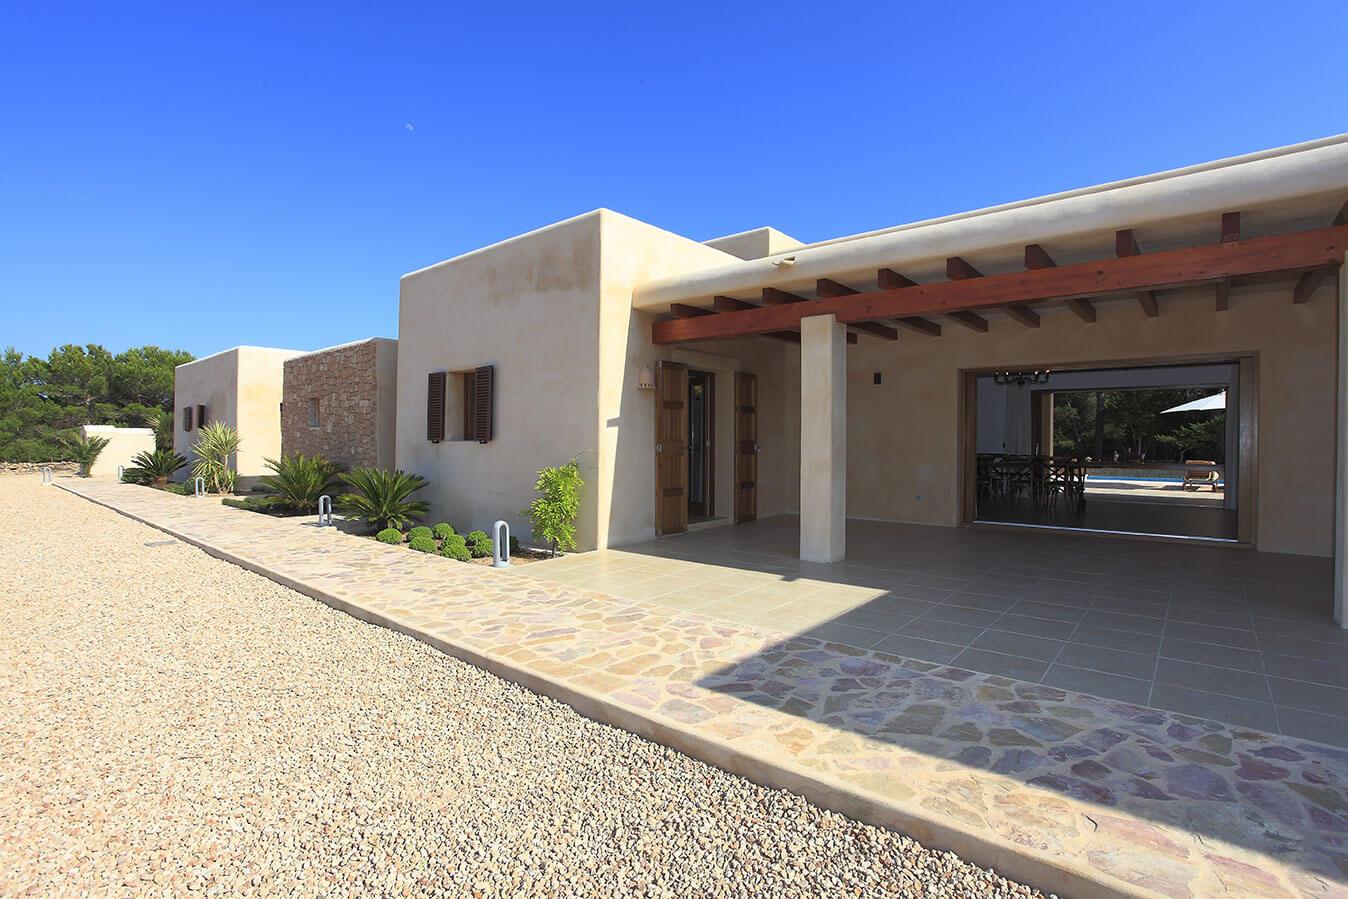 Entrada a villa Can Cardona en Formentera. Alojamientos turísticos Cardona